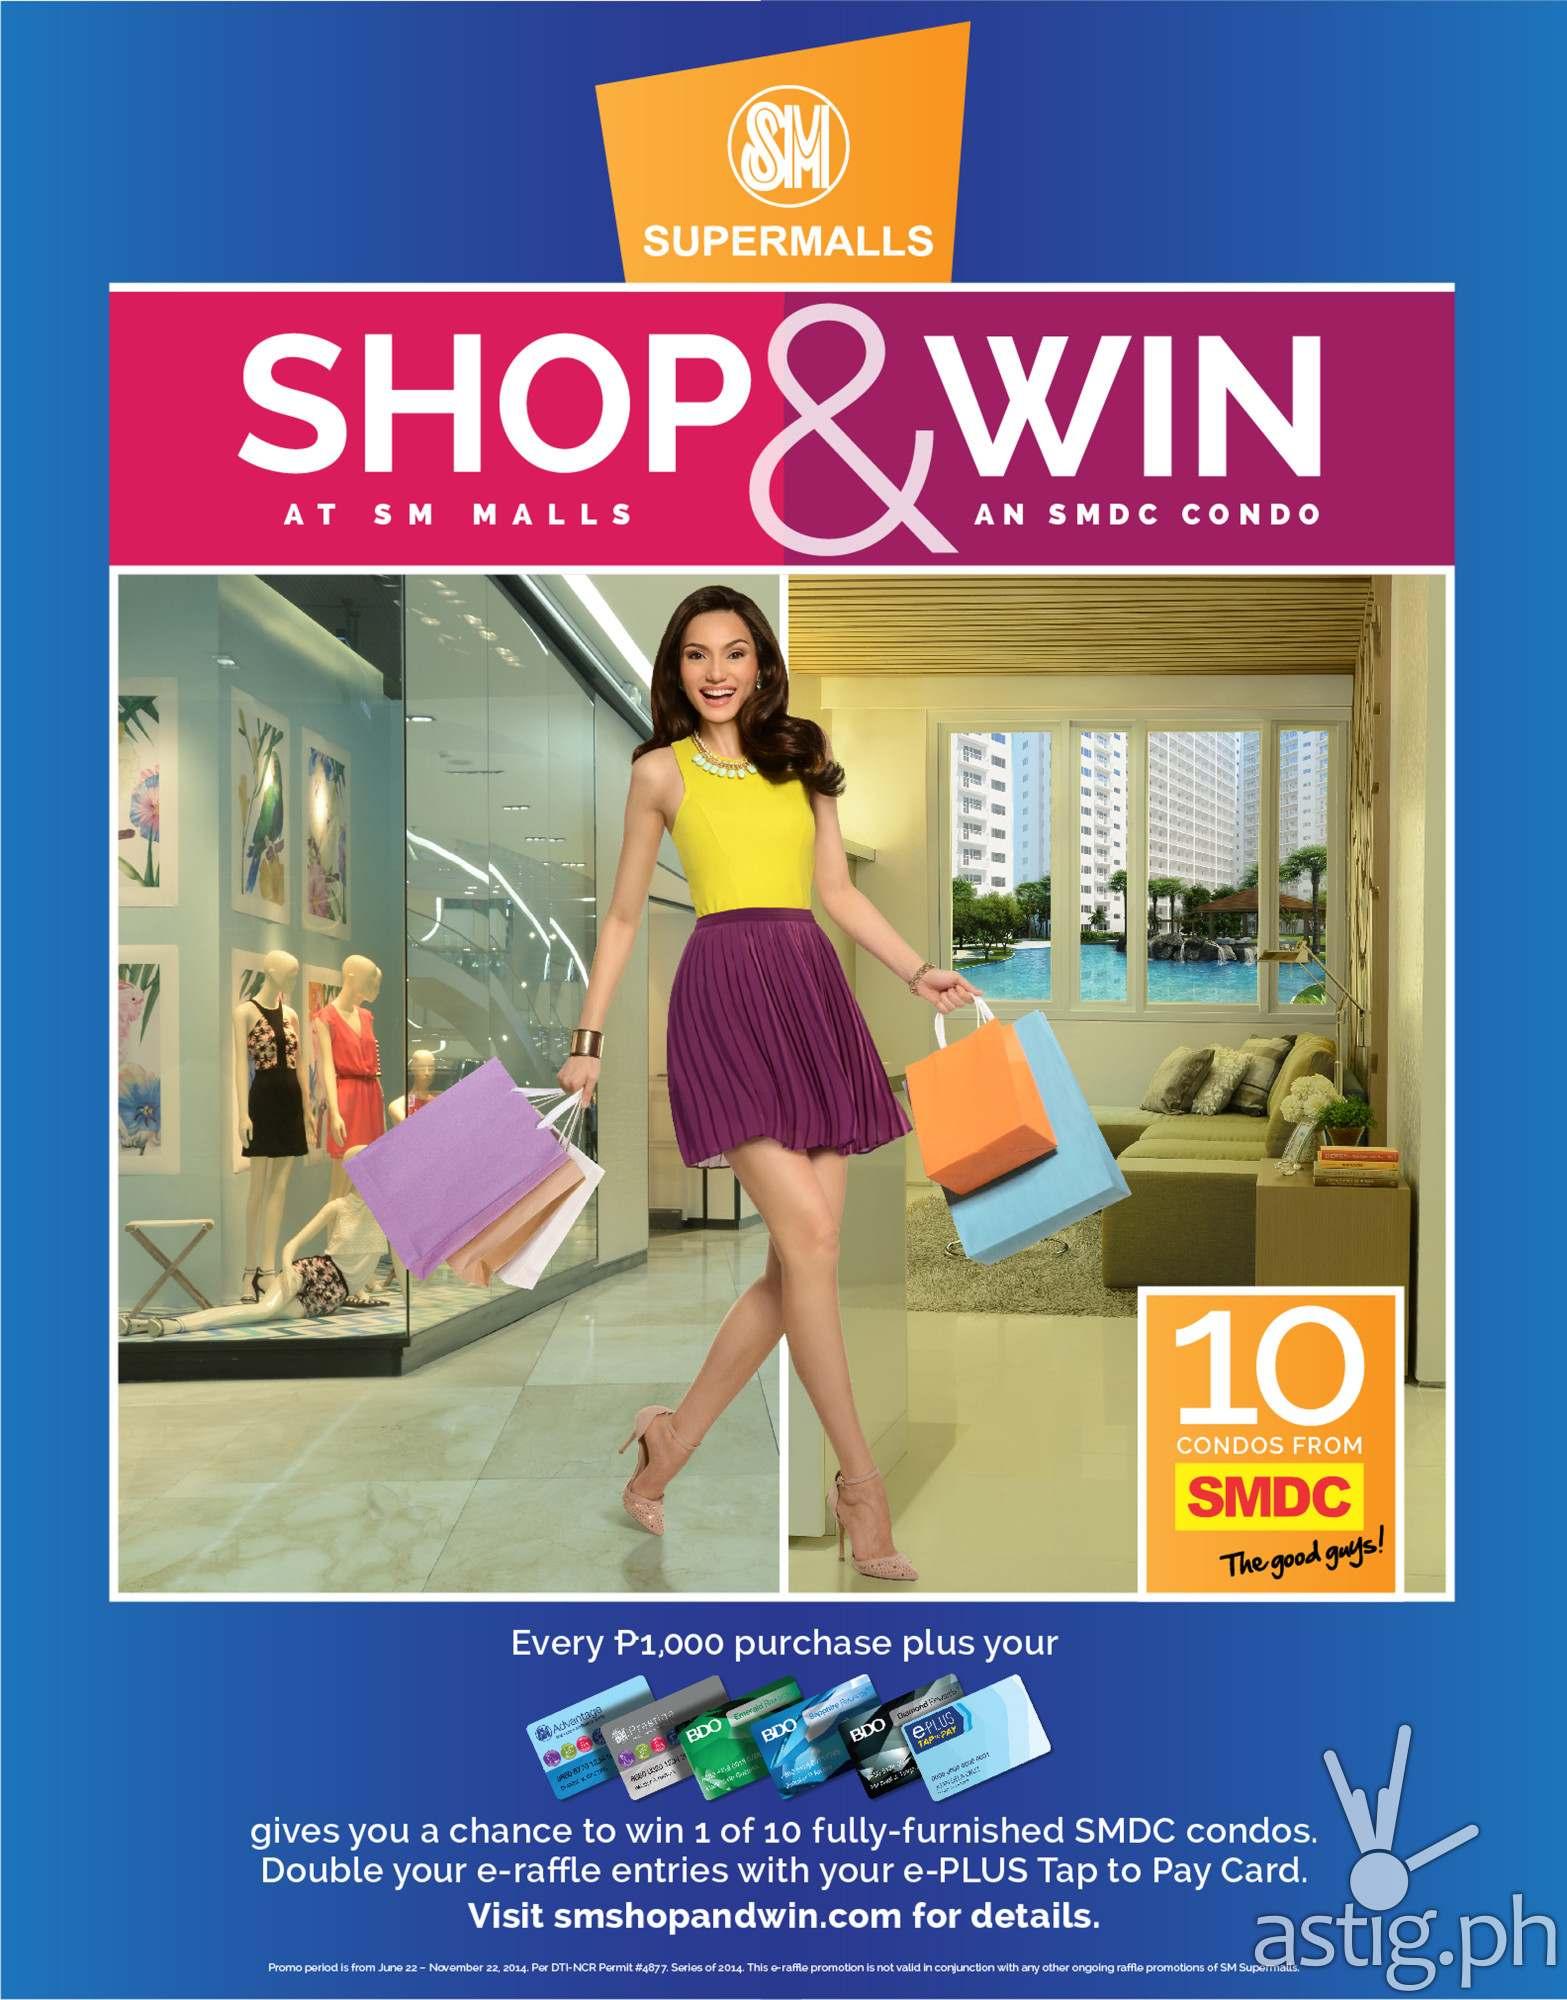 SM Supermalls Shop & Win promo